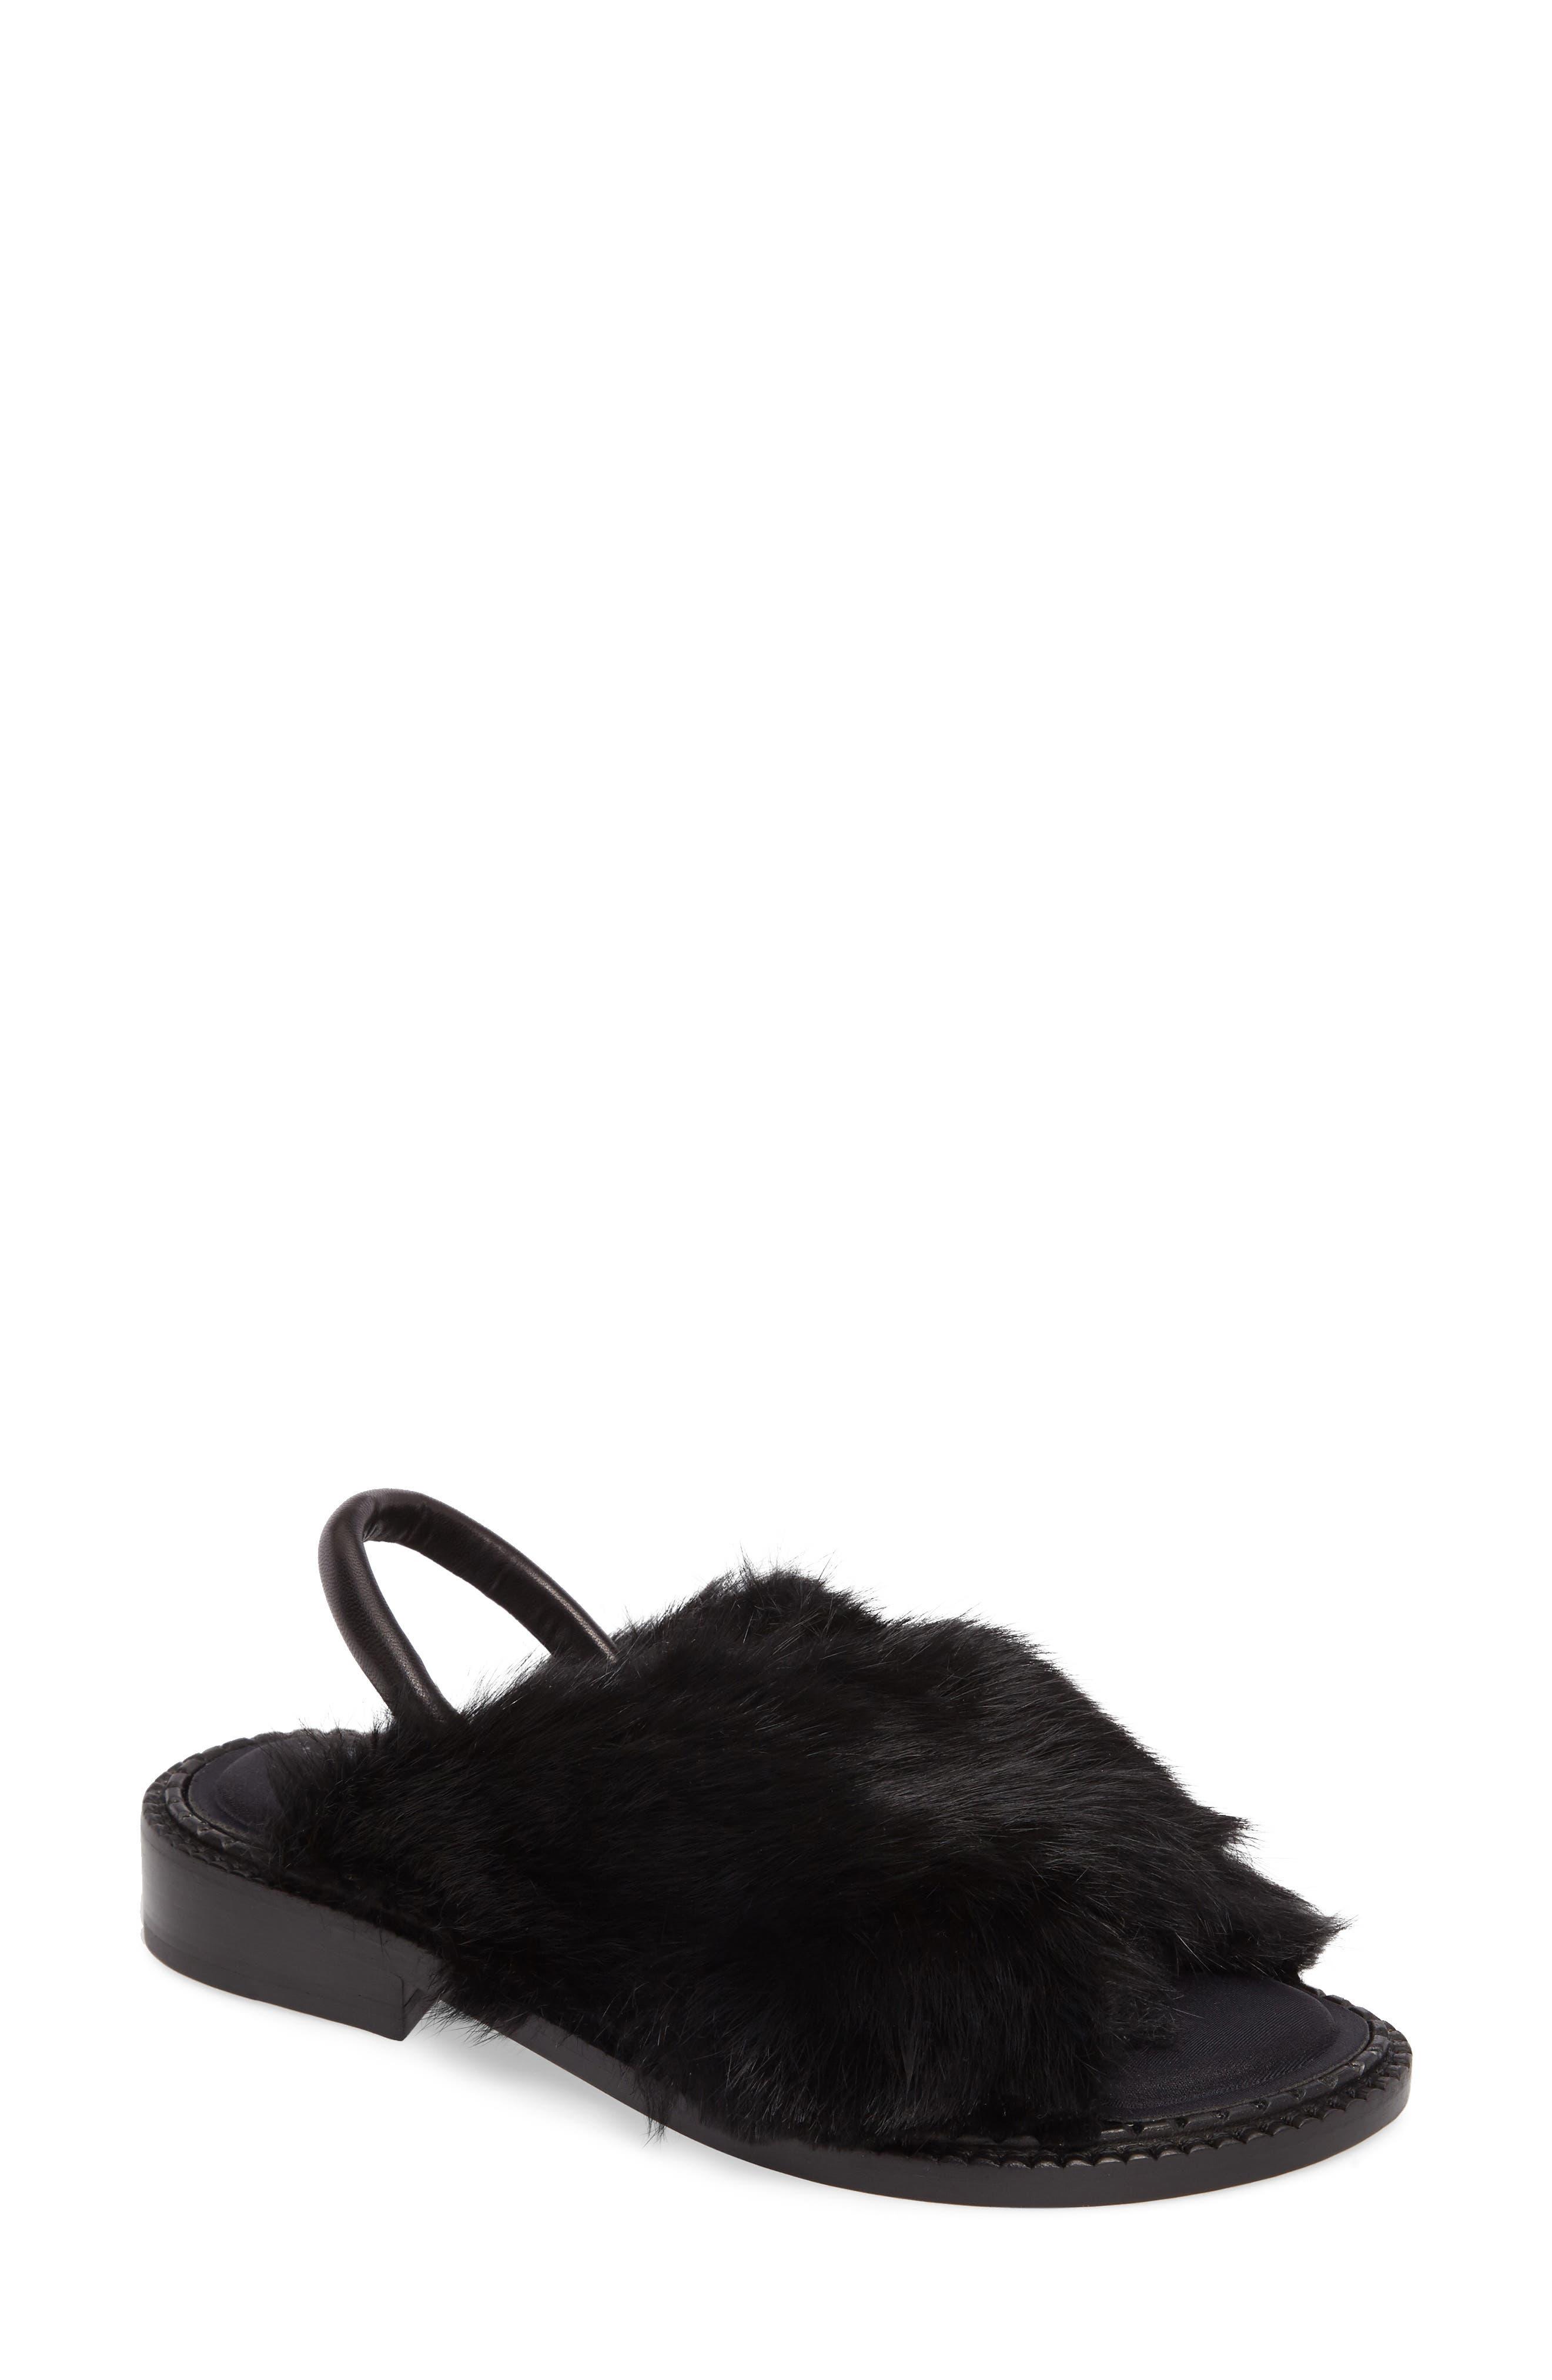 Main Image - Robert Clergerie Bloss Genuine Fur Sandal (Women)